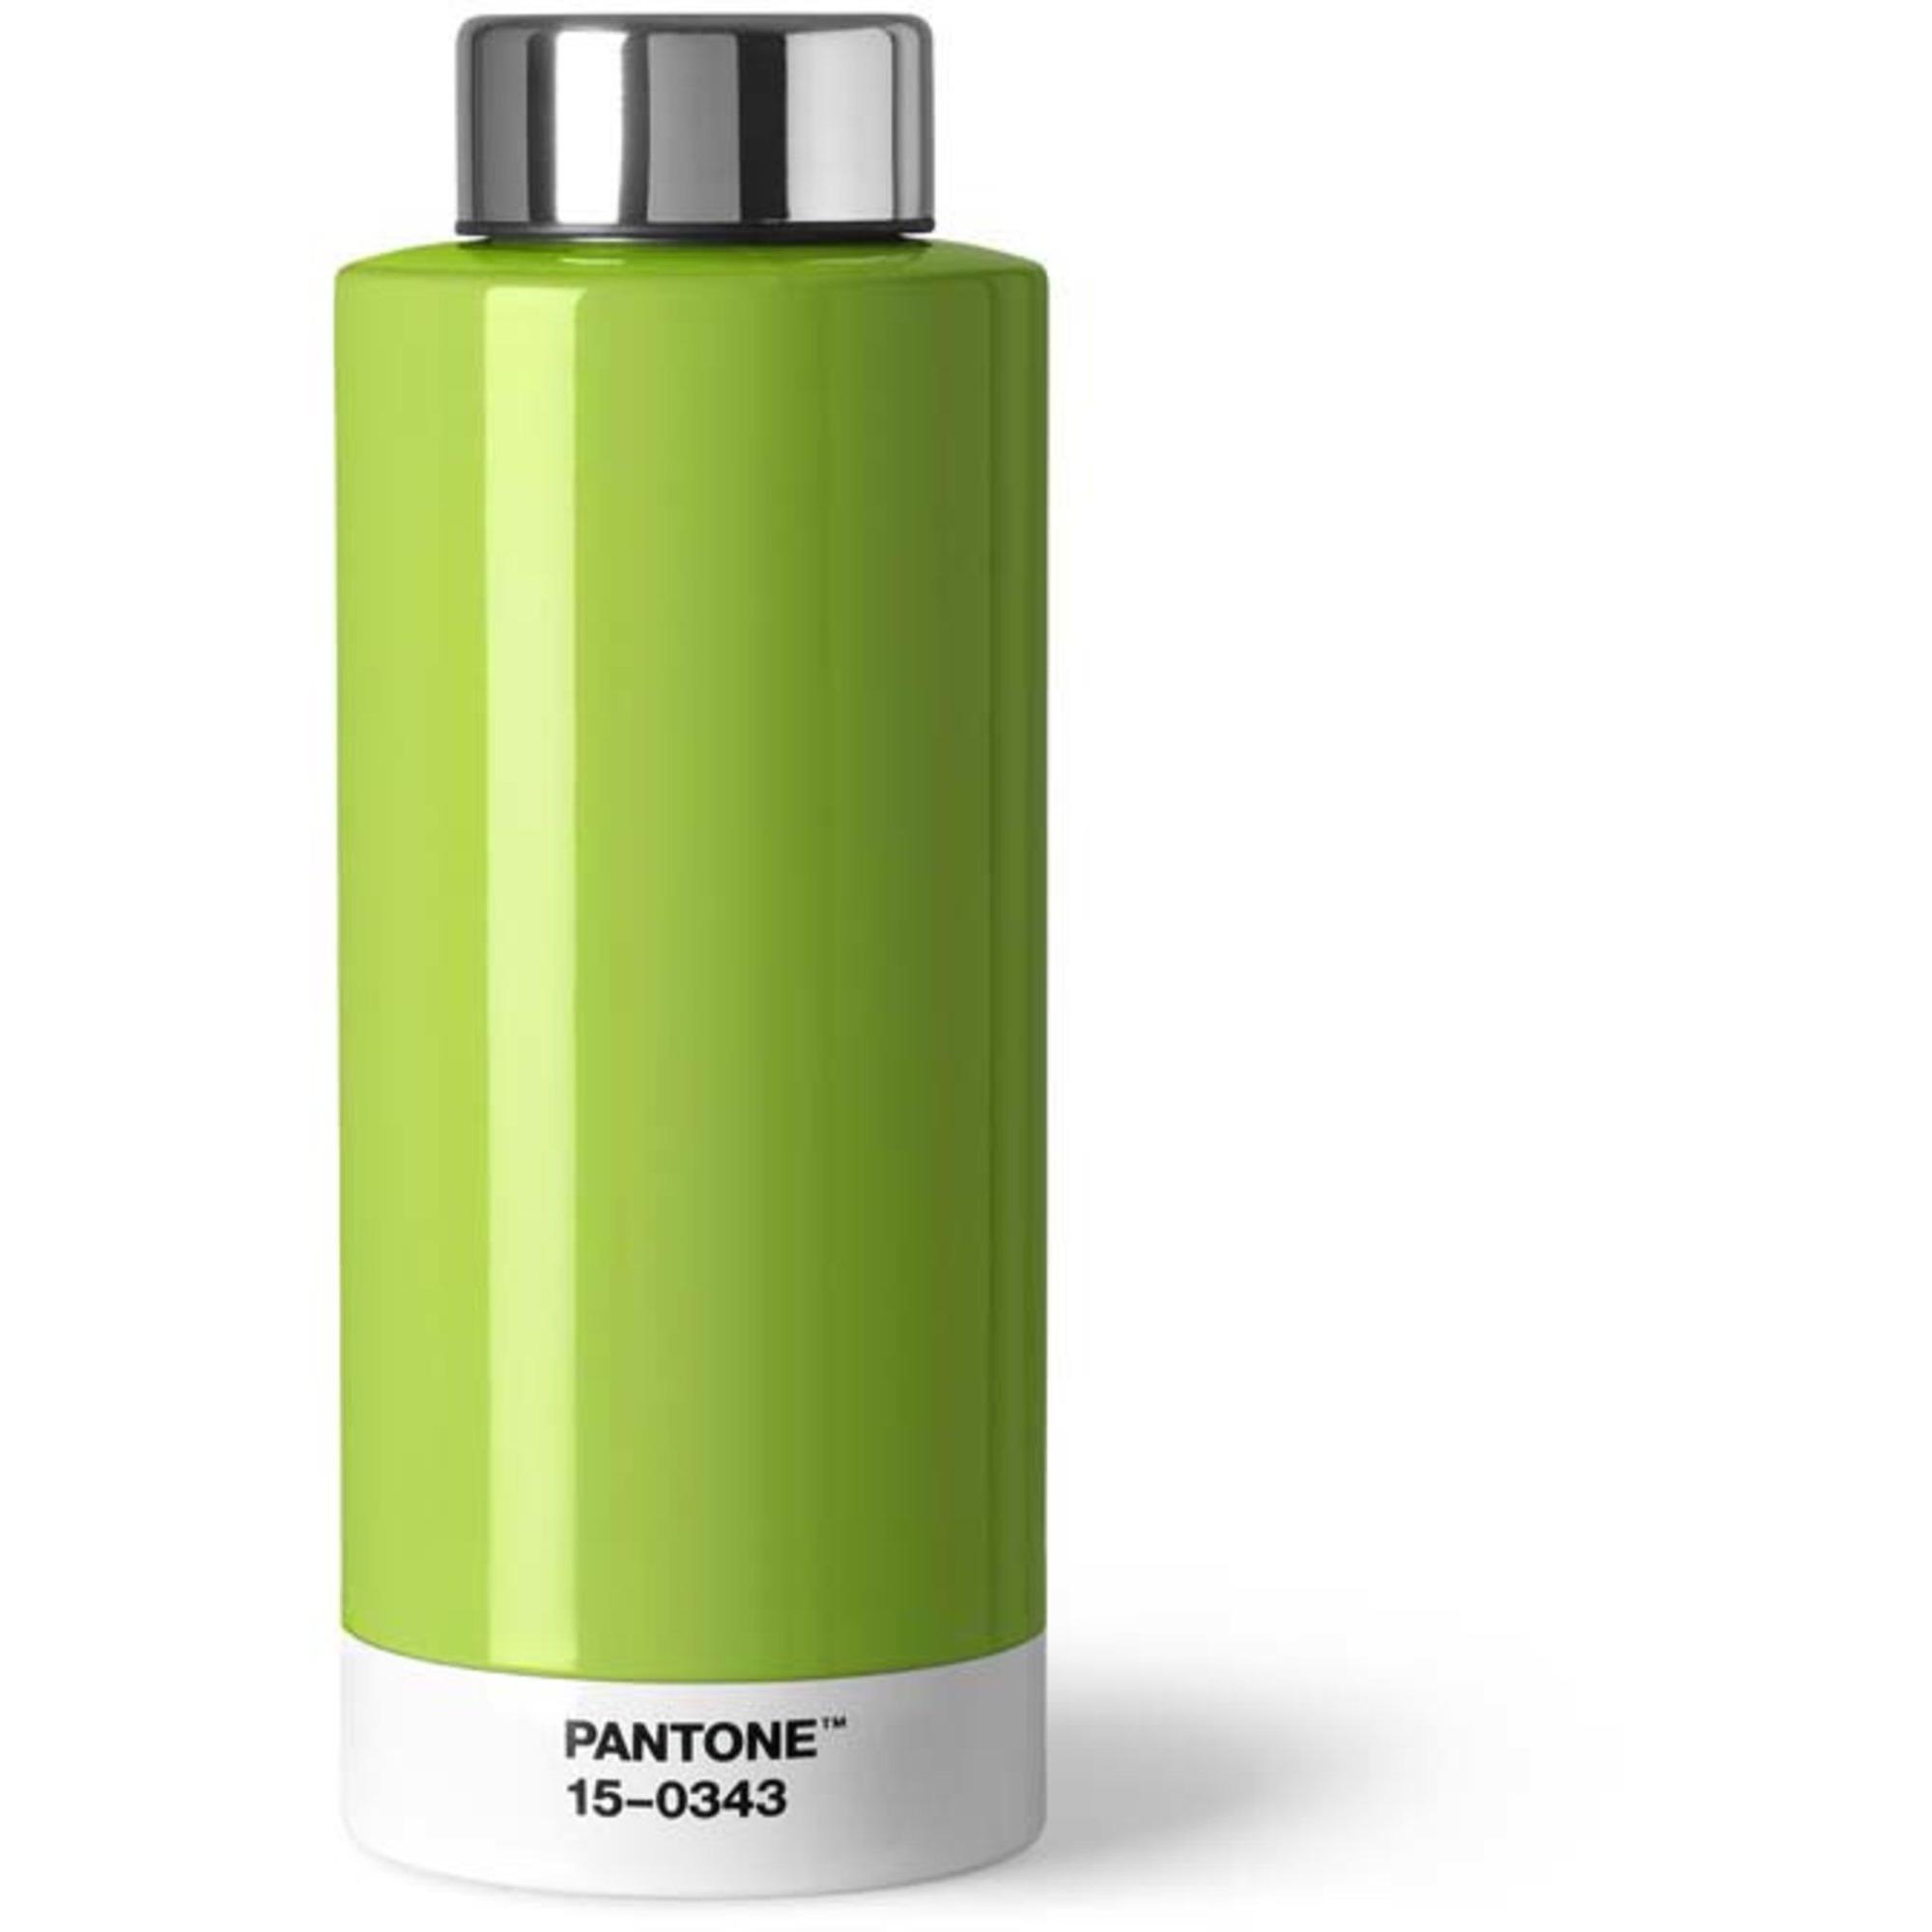 Pantone Living Vattenflaska 63 cl Grön